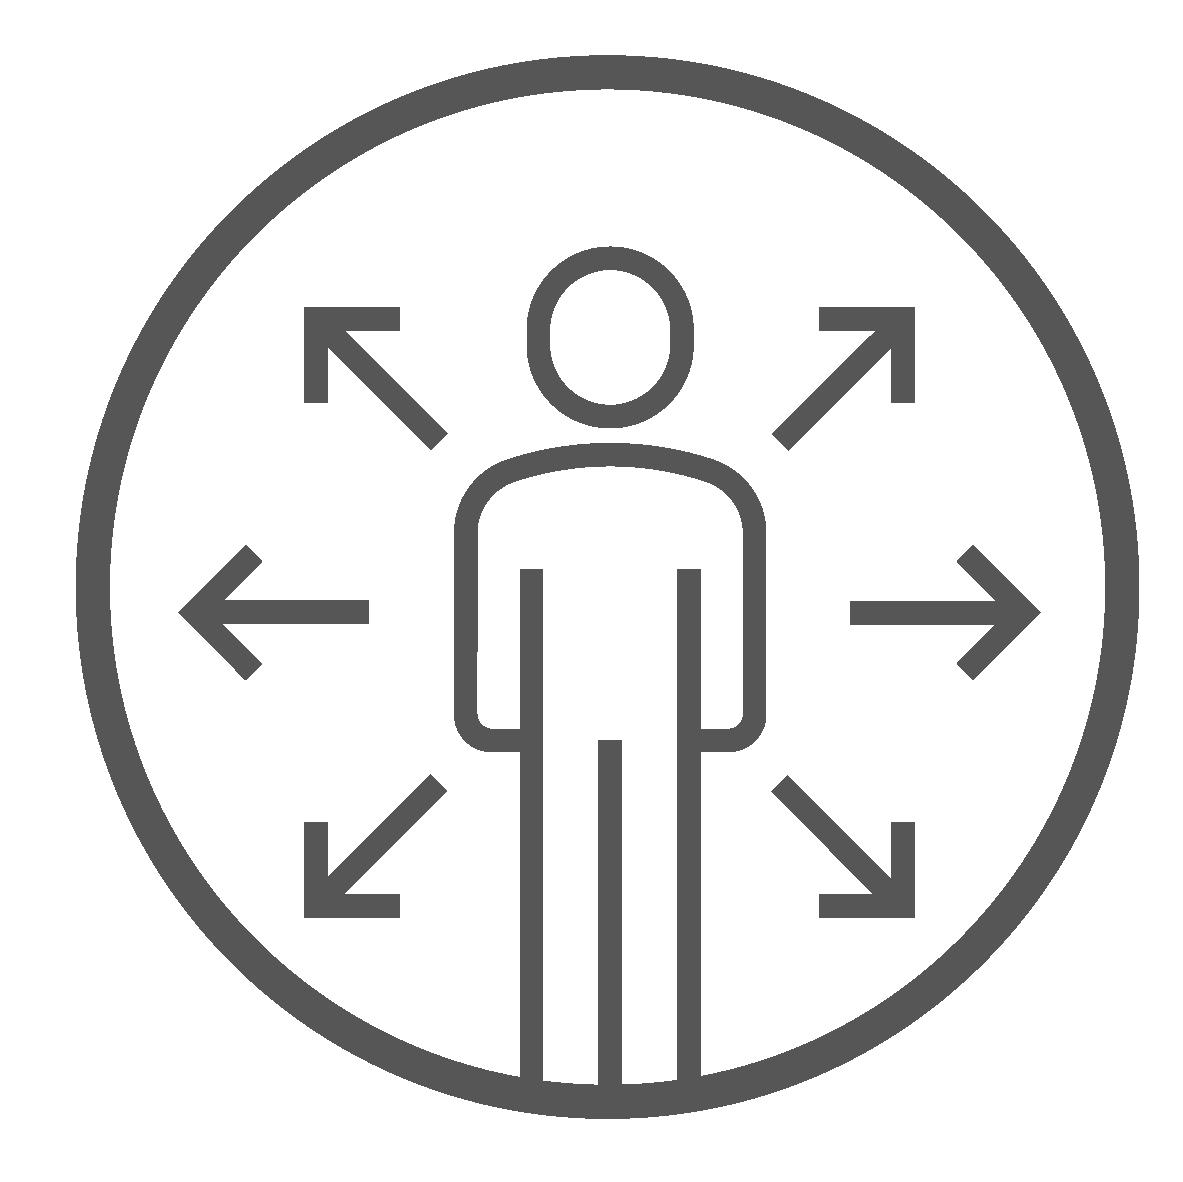 Innovation grey icon